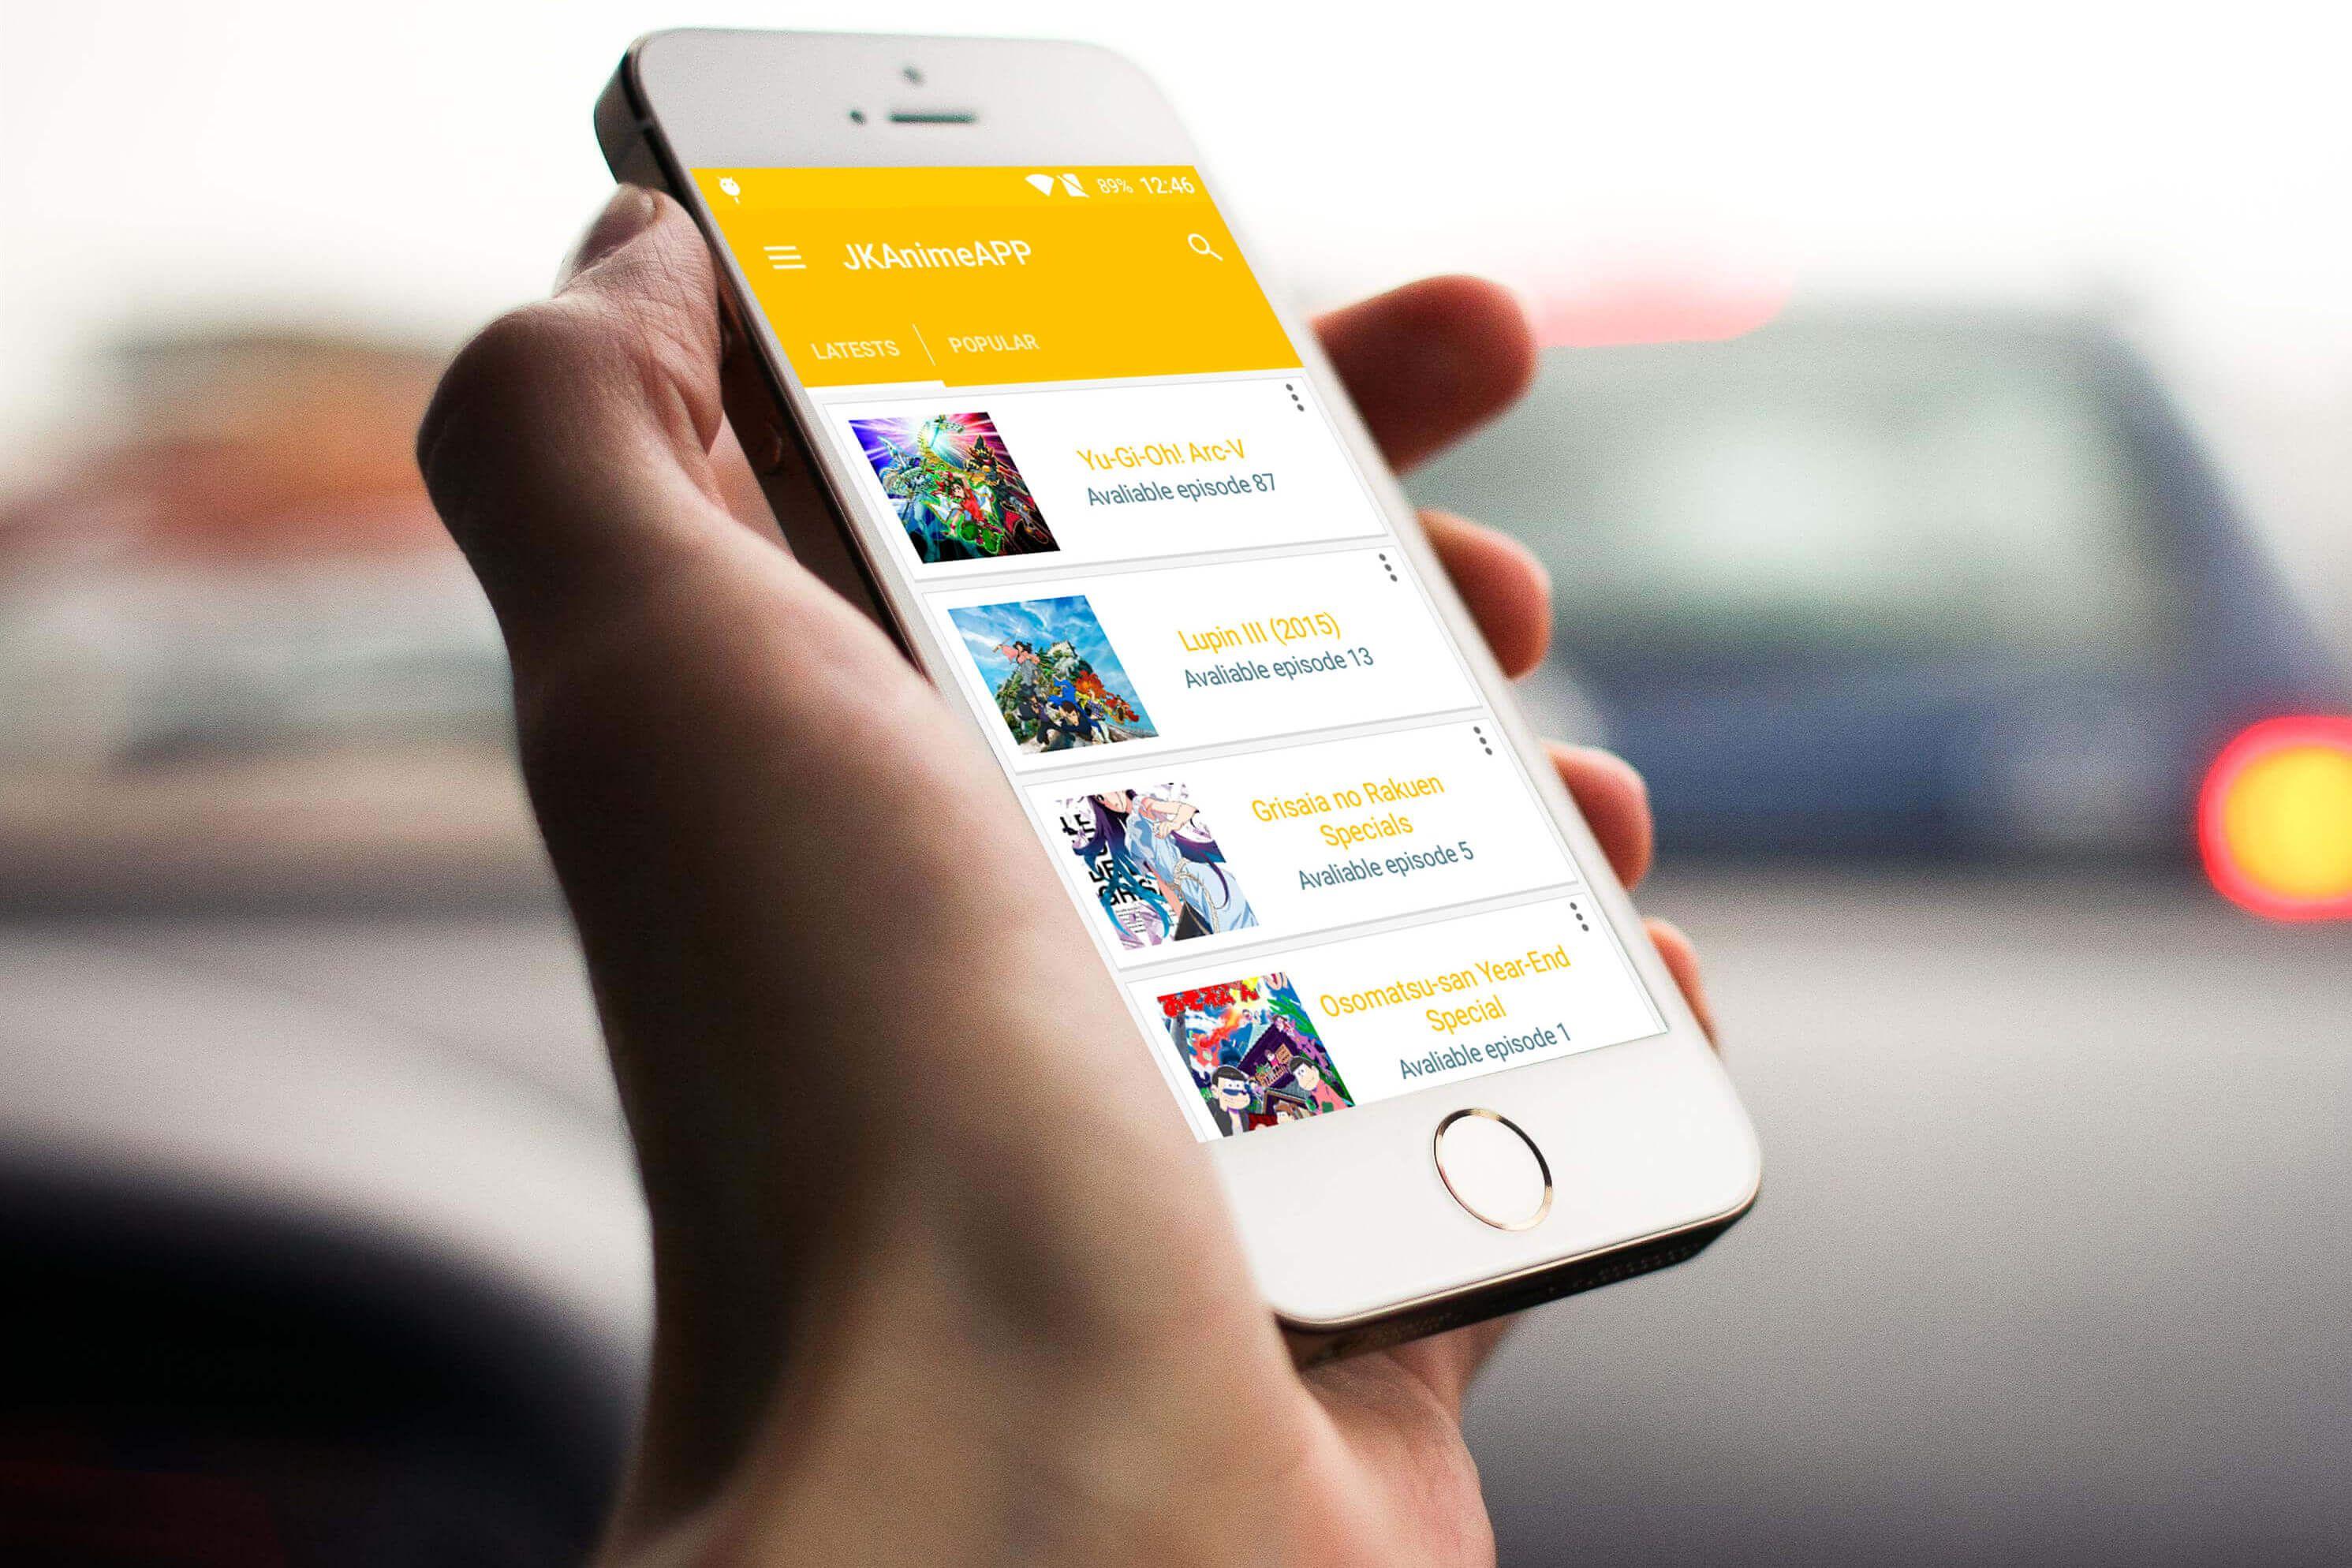 mobile billing software free download full version